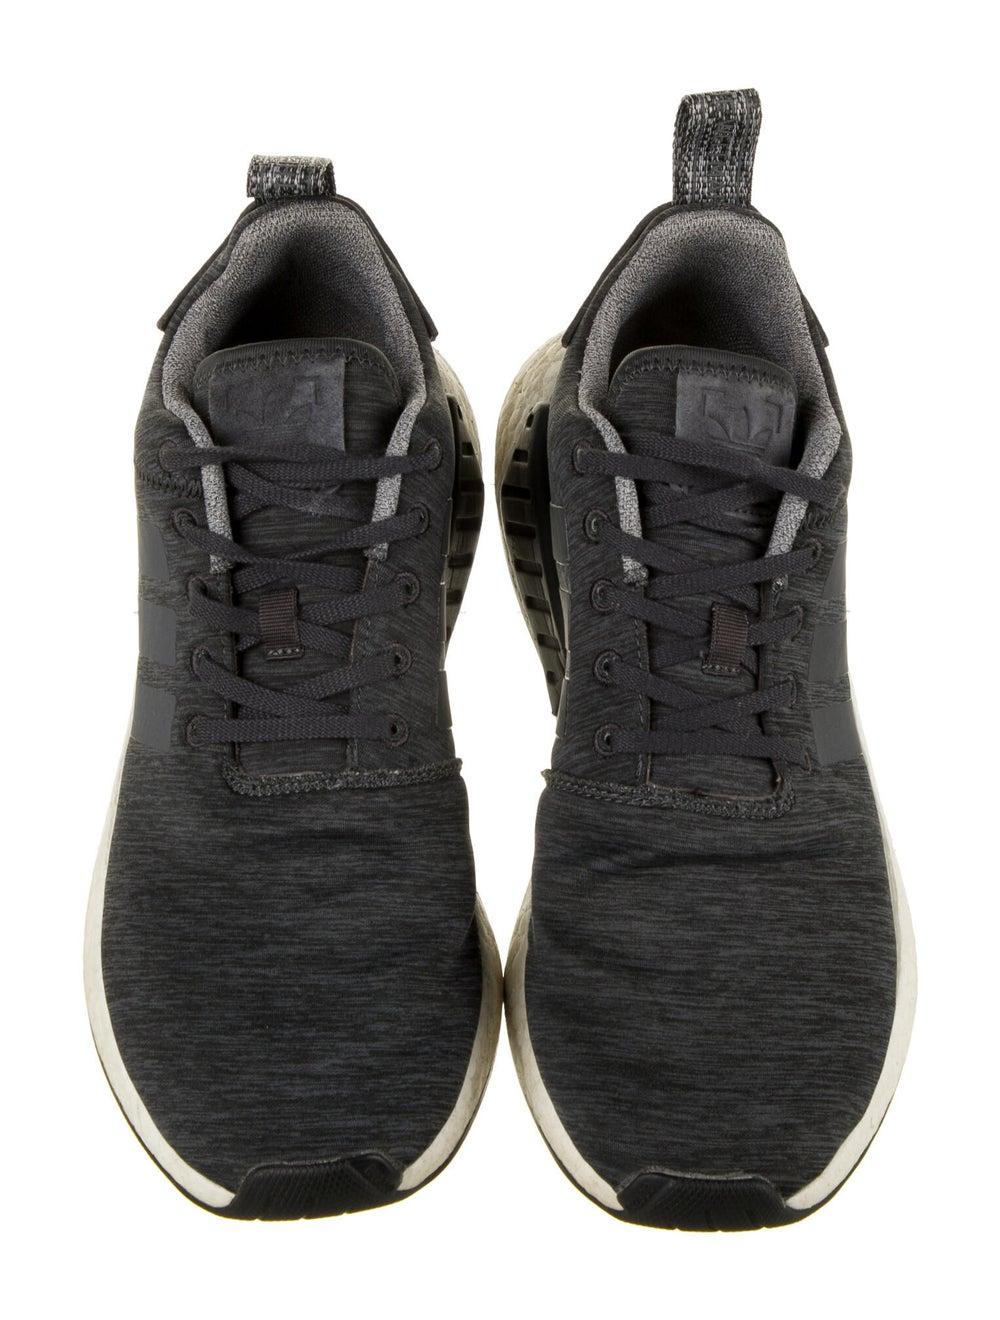 Adidas Athletic Sneakers Grey - image 3